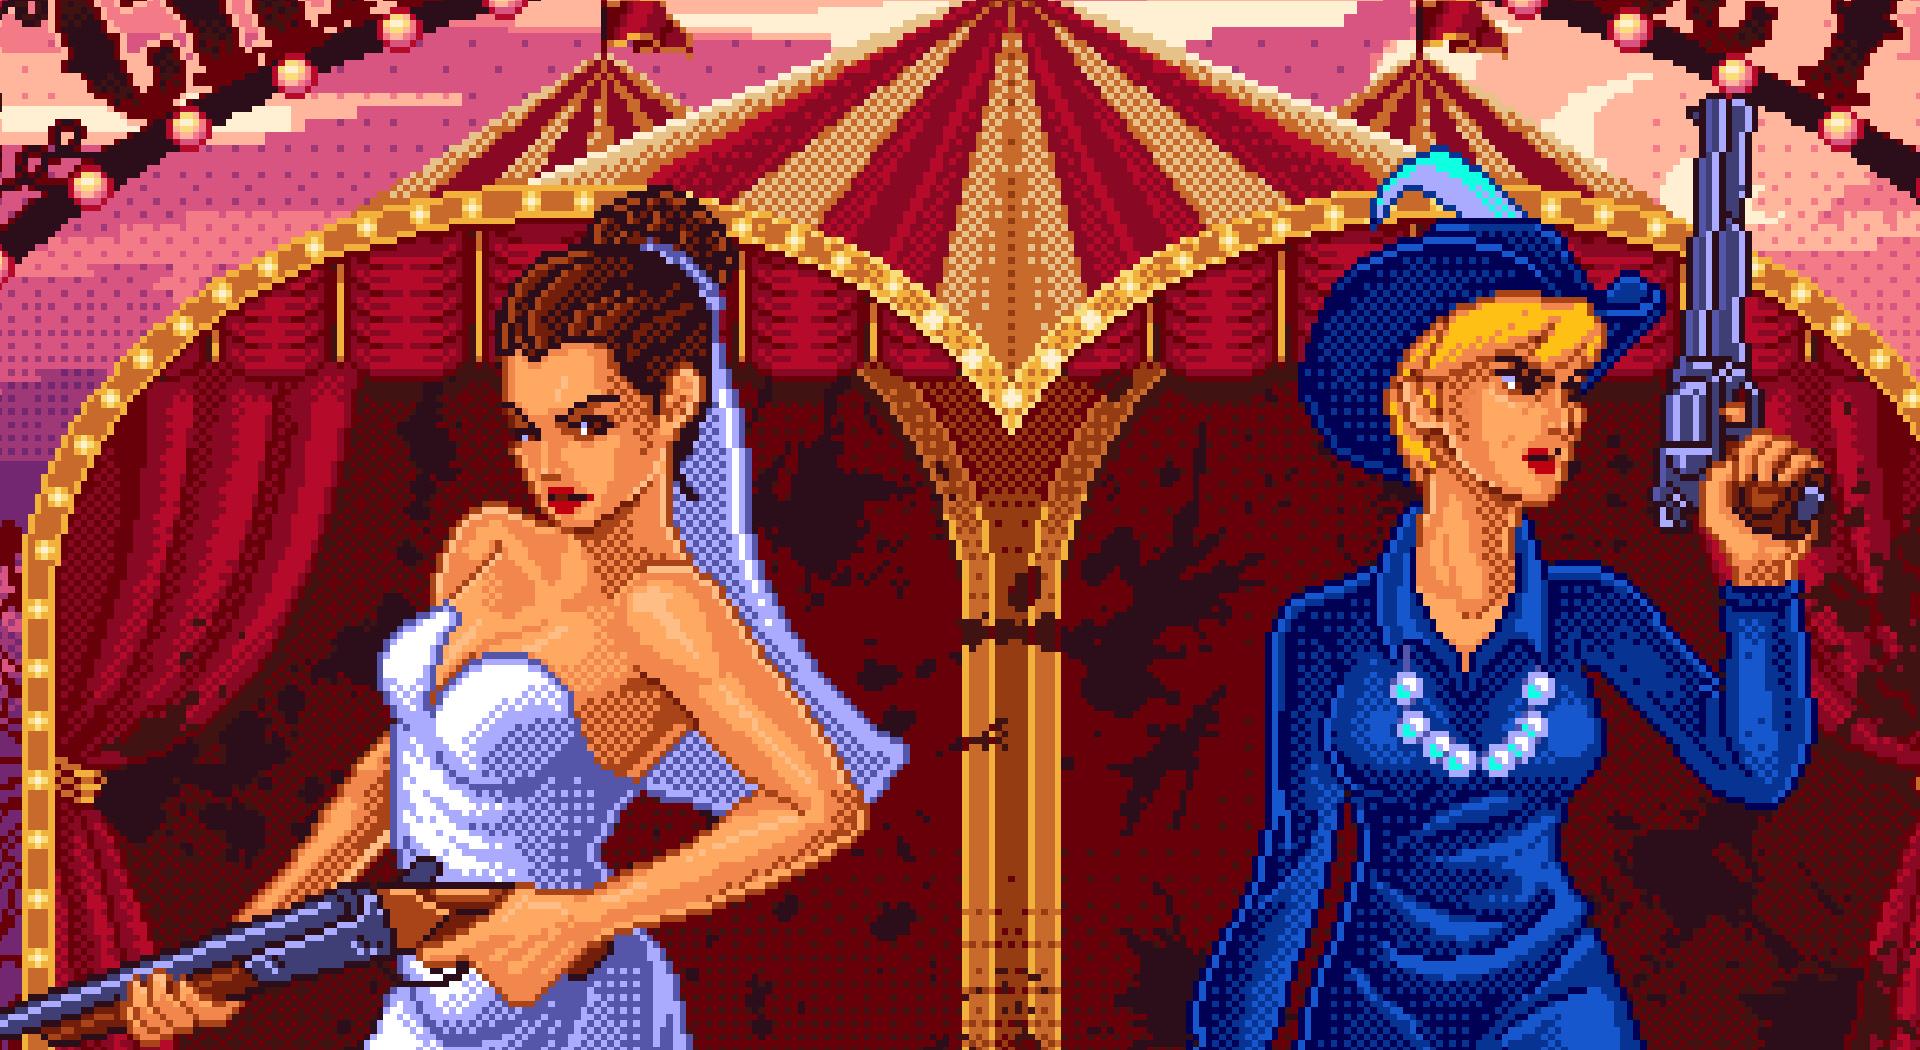 Lethal Wedding Gameplay Footage Released